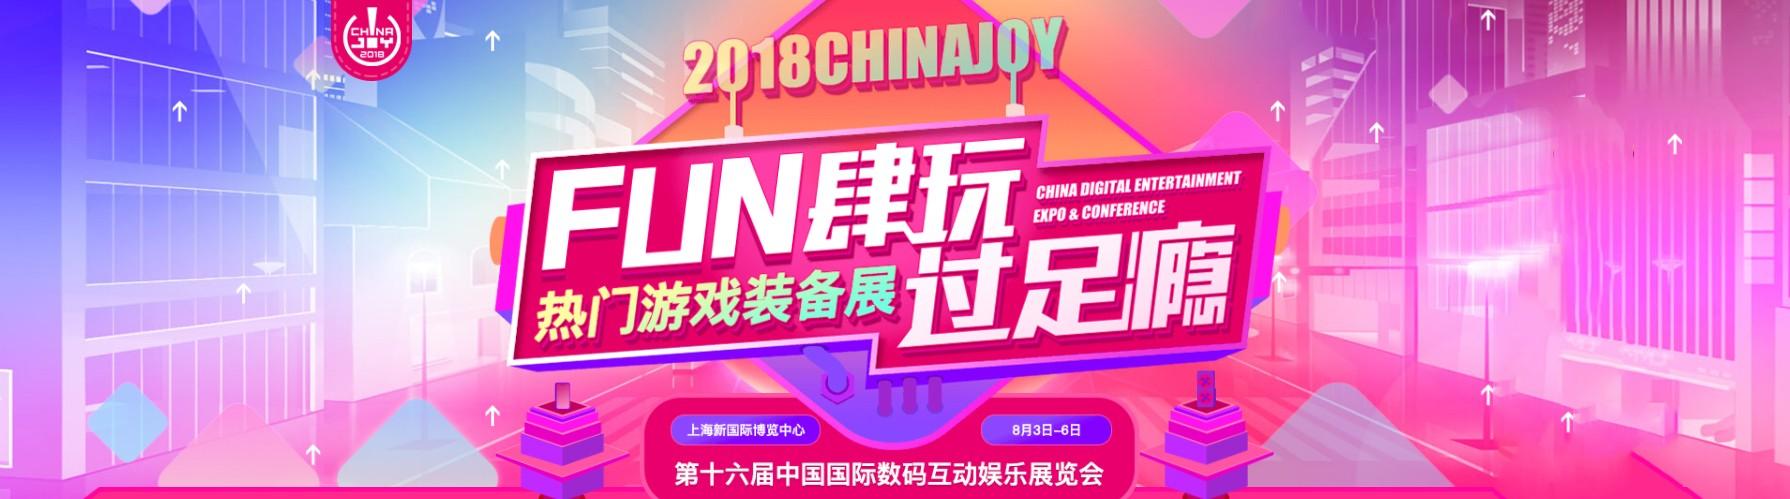 chinajoy2018